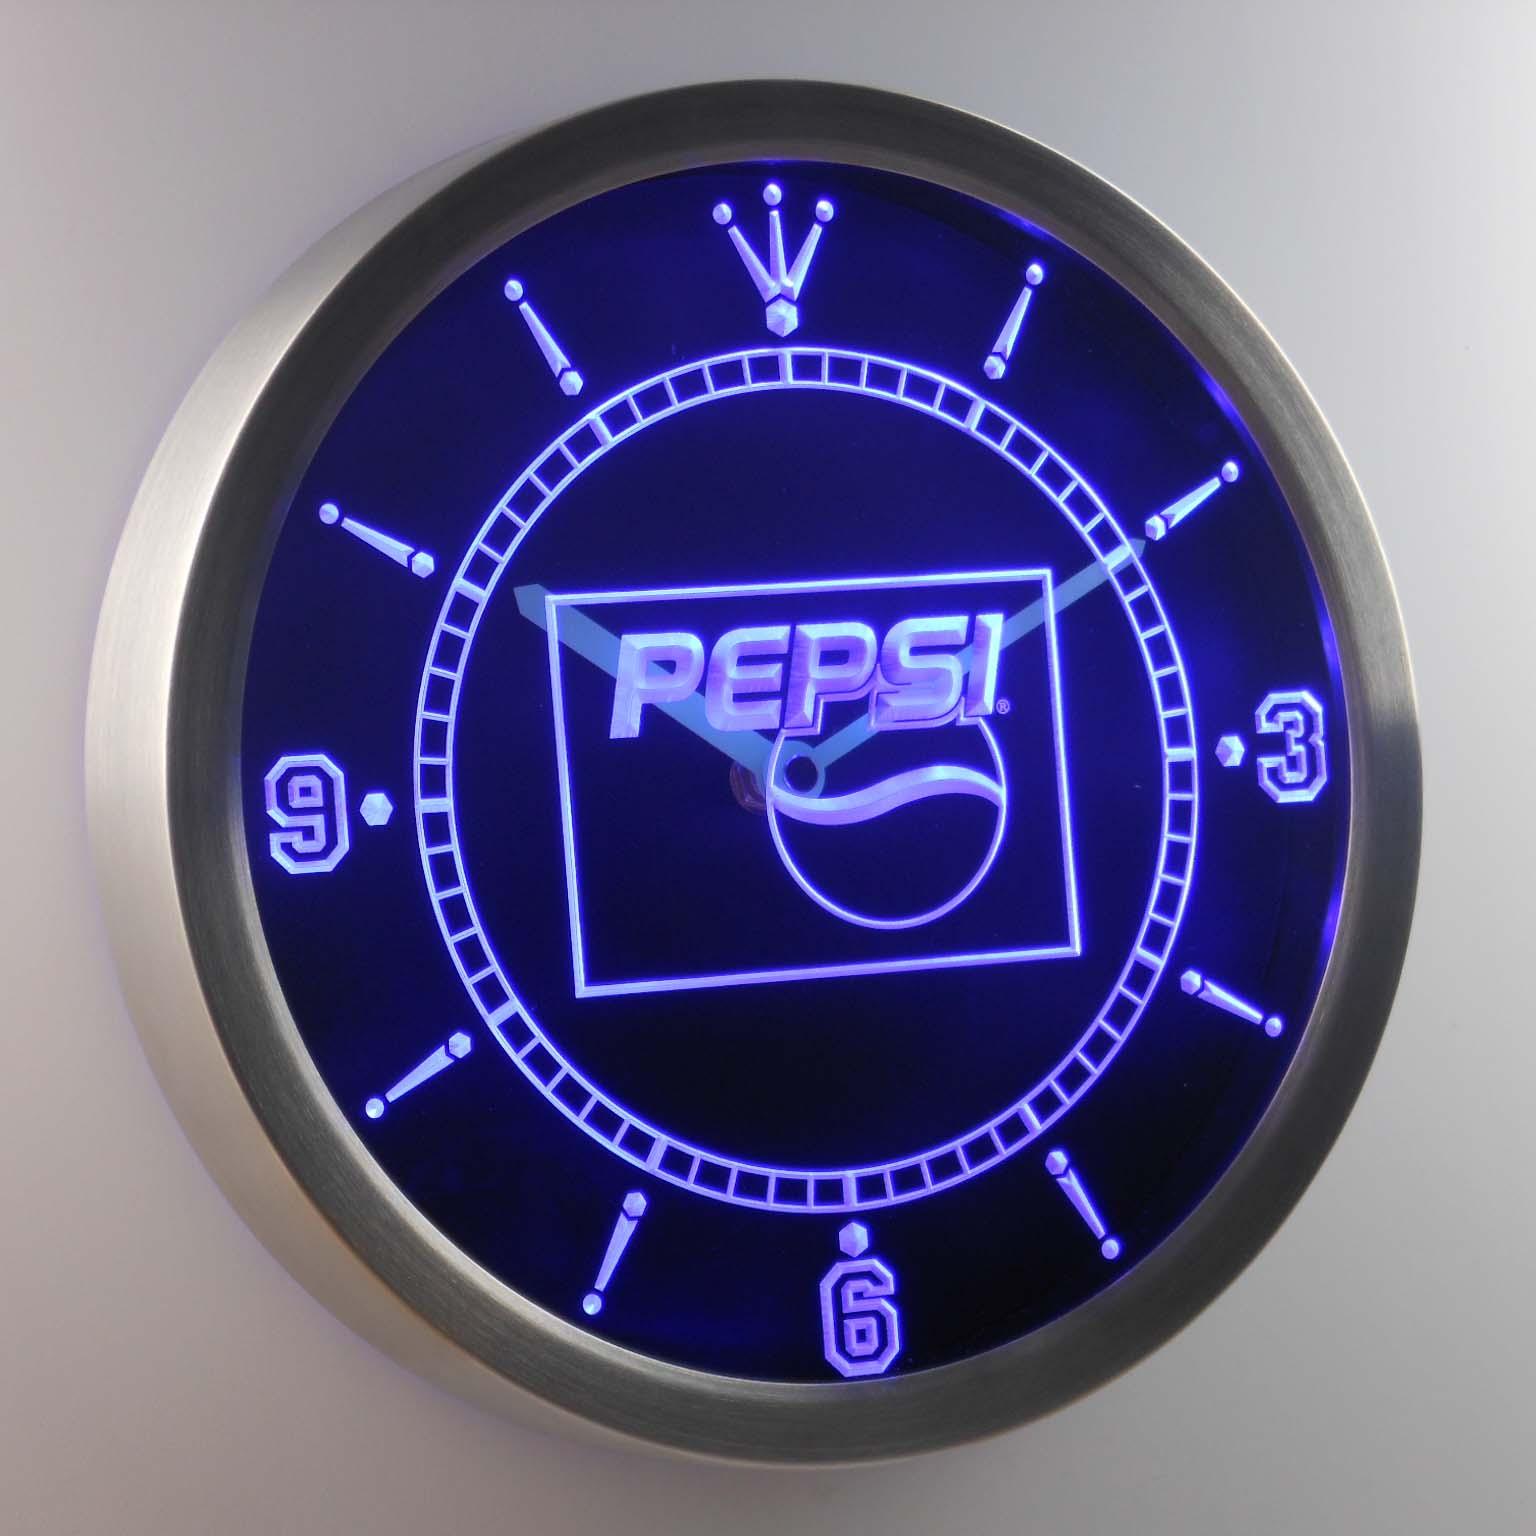 nc0095 Pepsi Neon Sign LED Wall Clocknc0095 Pepsi Neon Sign LED Wall Clock